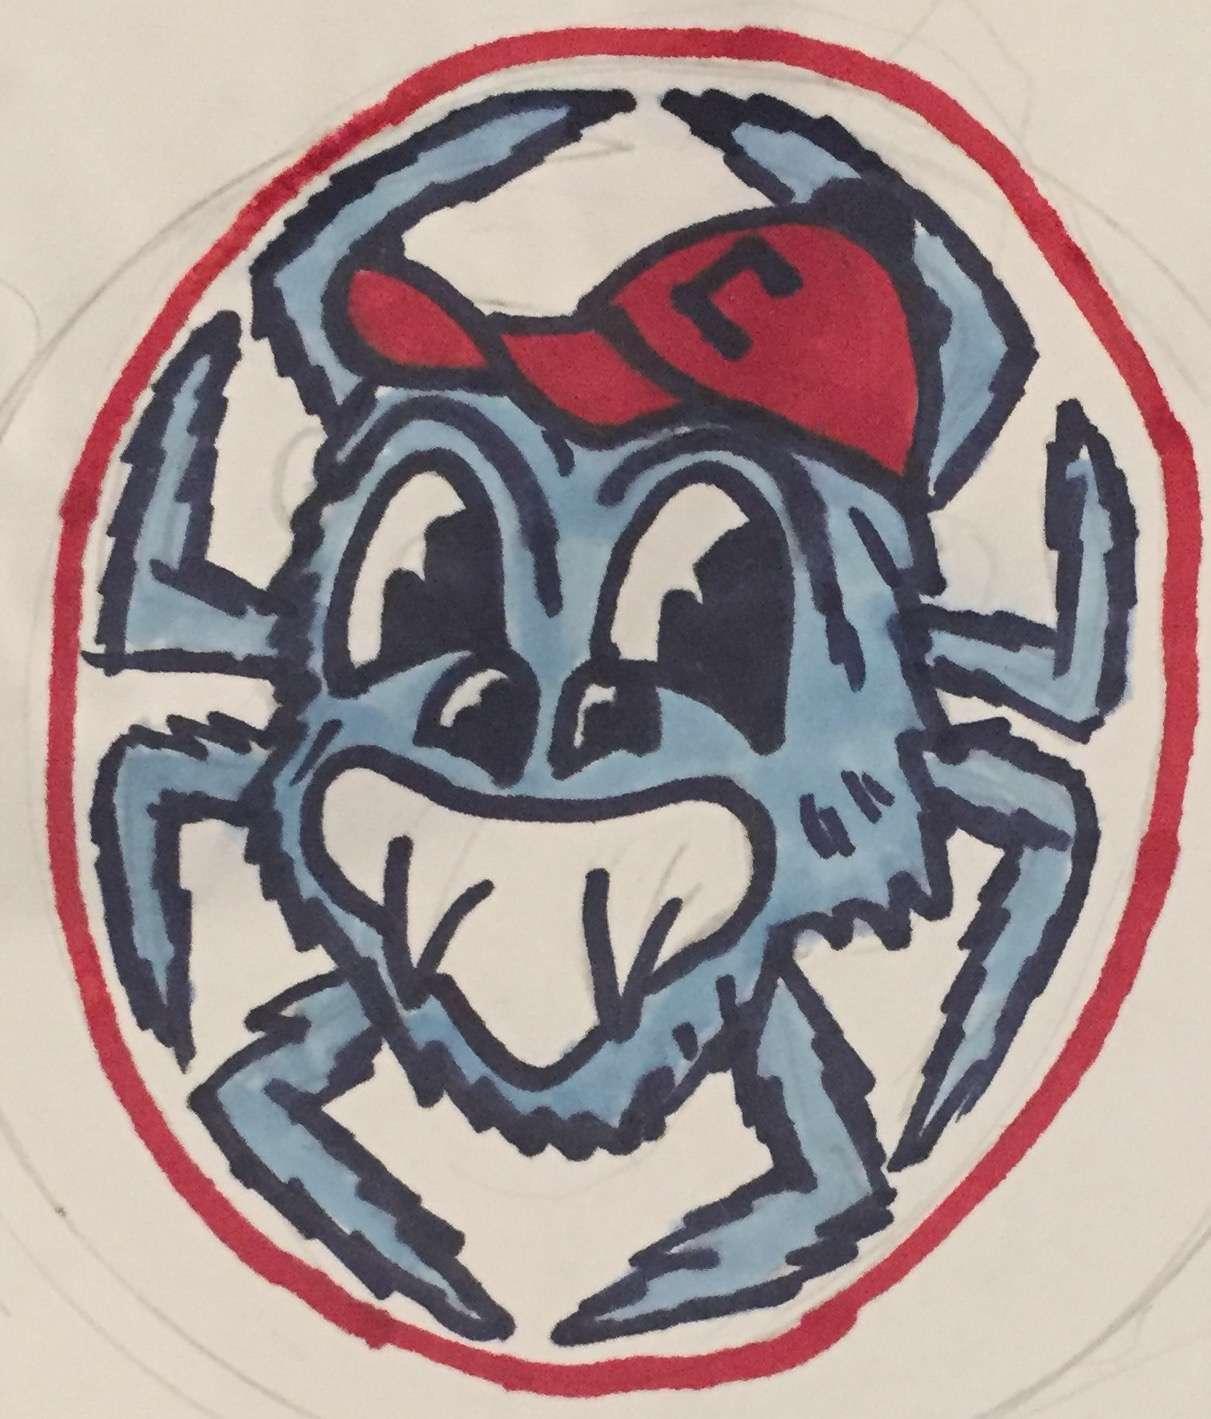 cleveland-spiders-logo-8.jpg